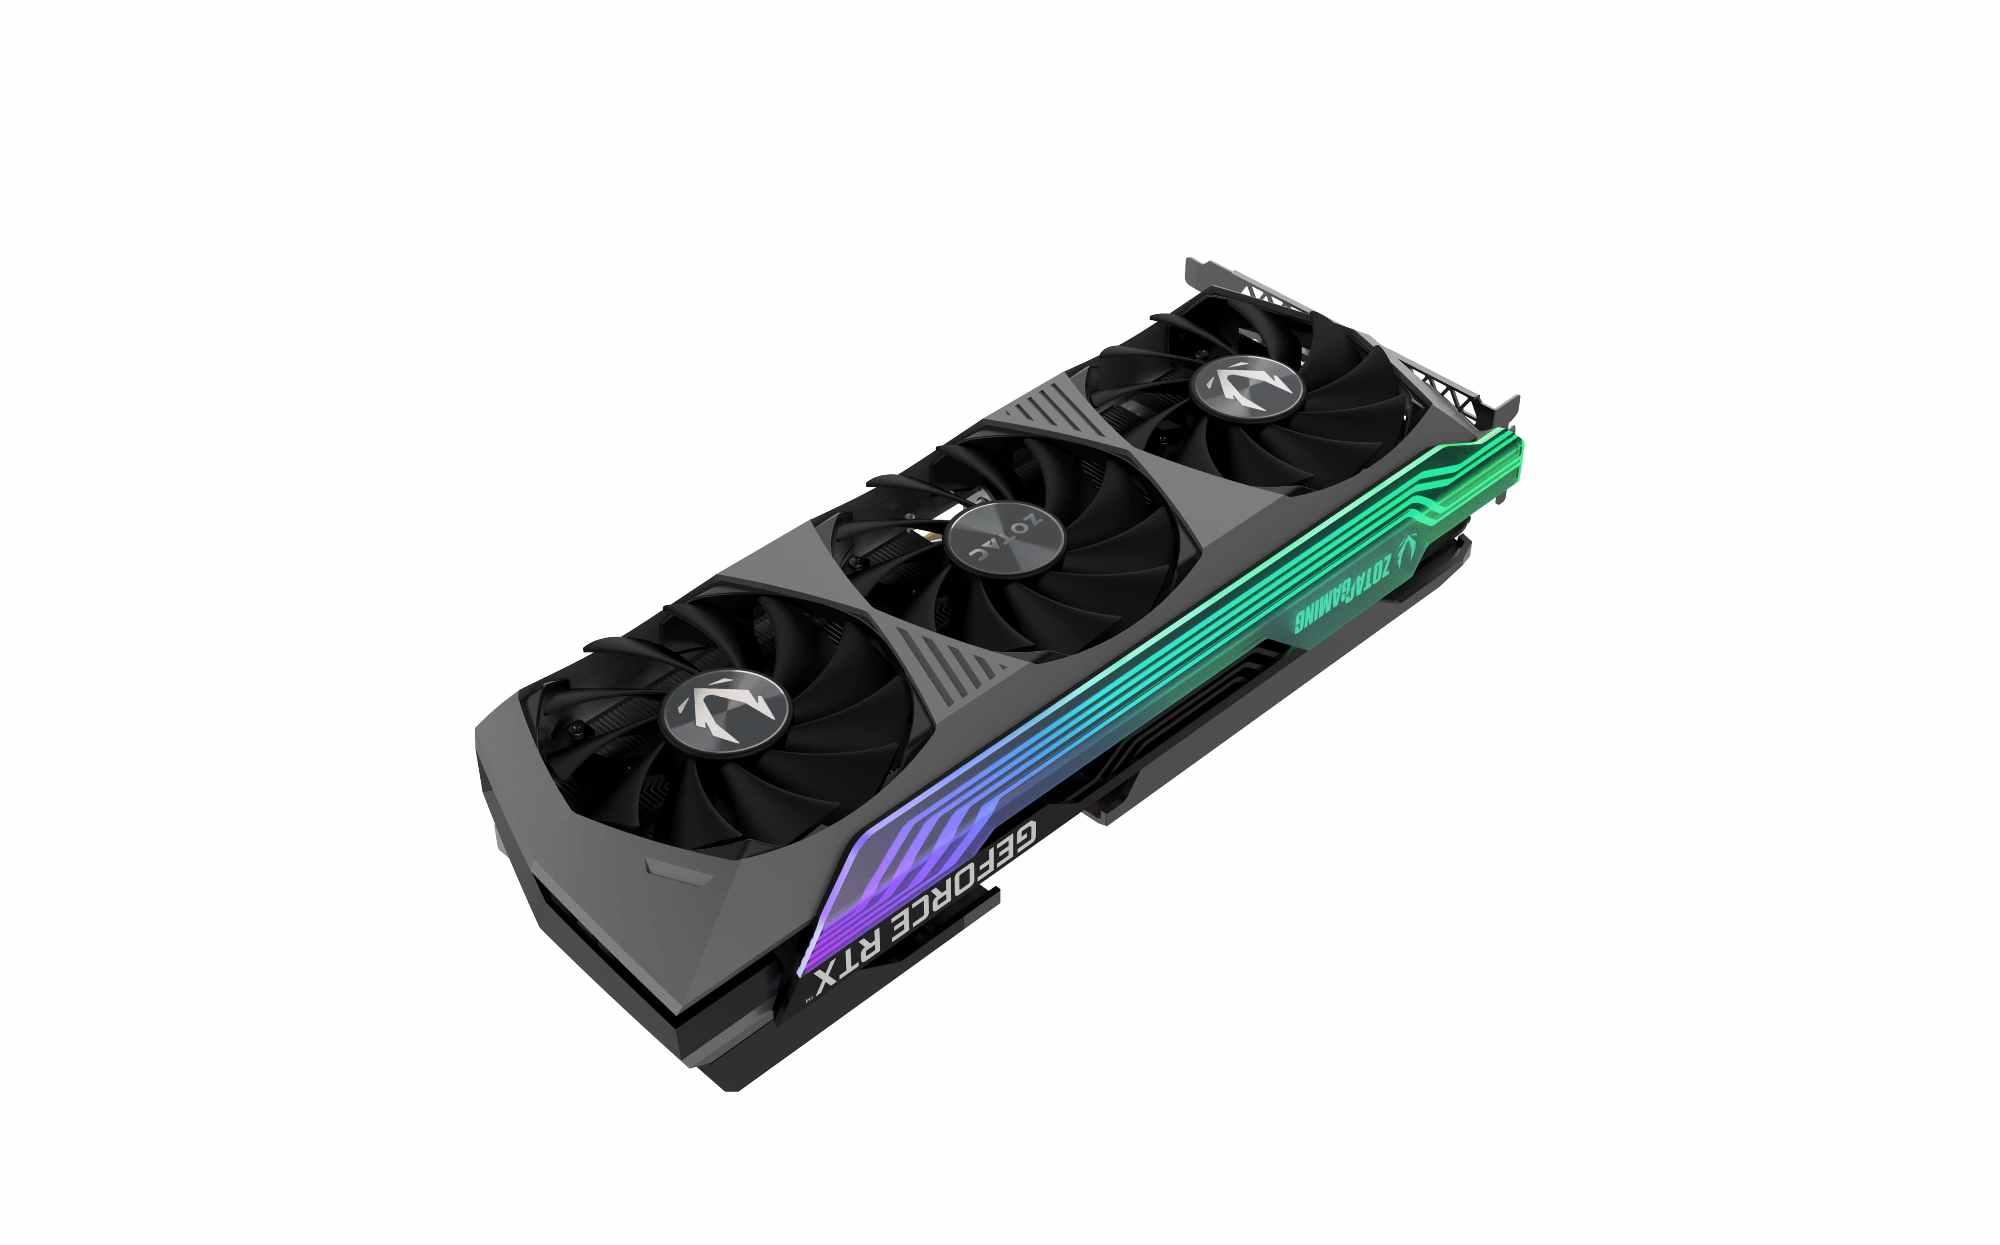 ZOTAC GAMING GeForce RTX 3080 Ti AMP HOLO OC